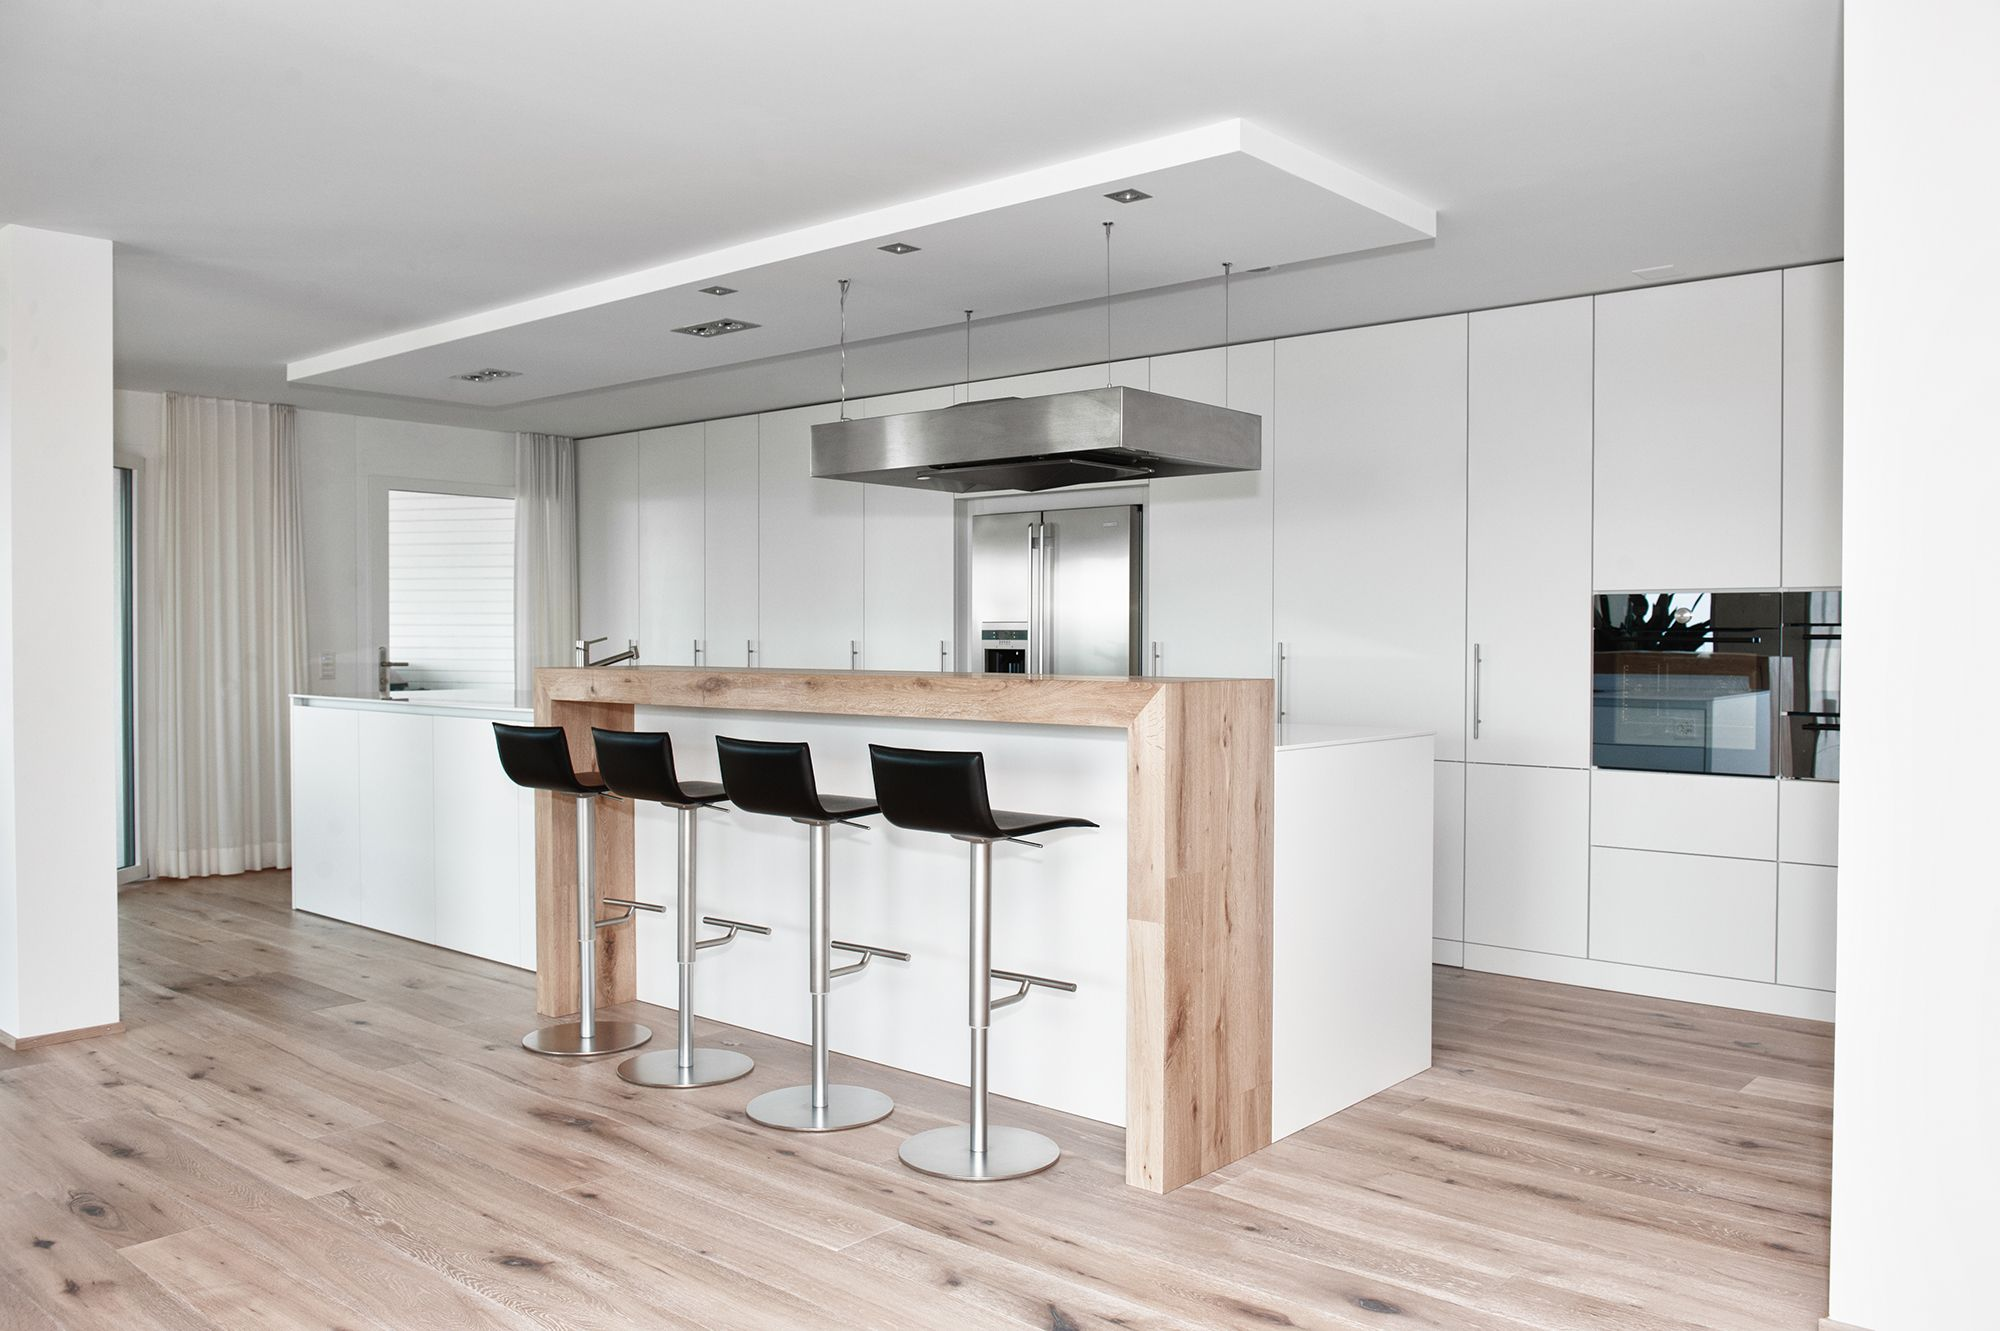 Woodworker Küchen ~ Moderne küche kochinsel weiß matt holz theke kappa armony wohn